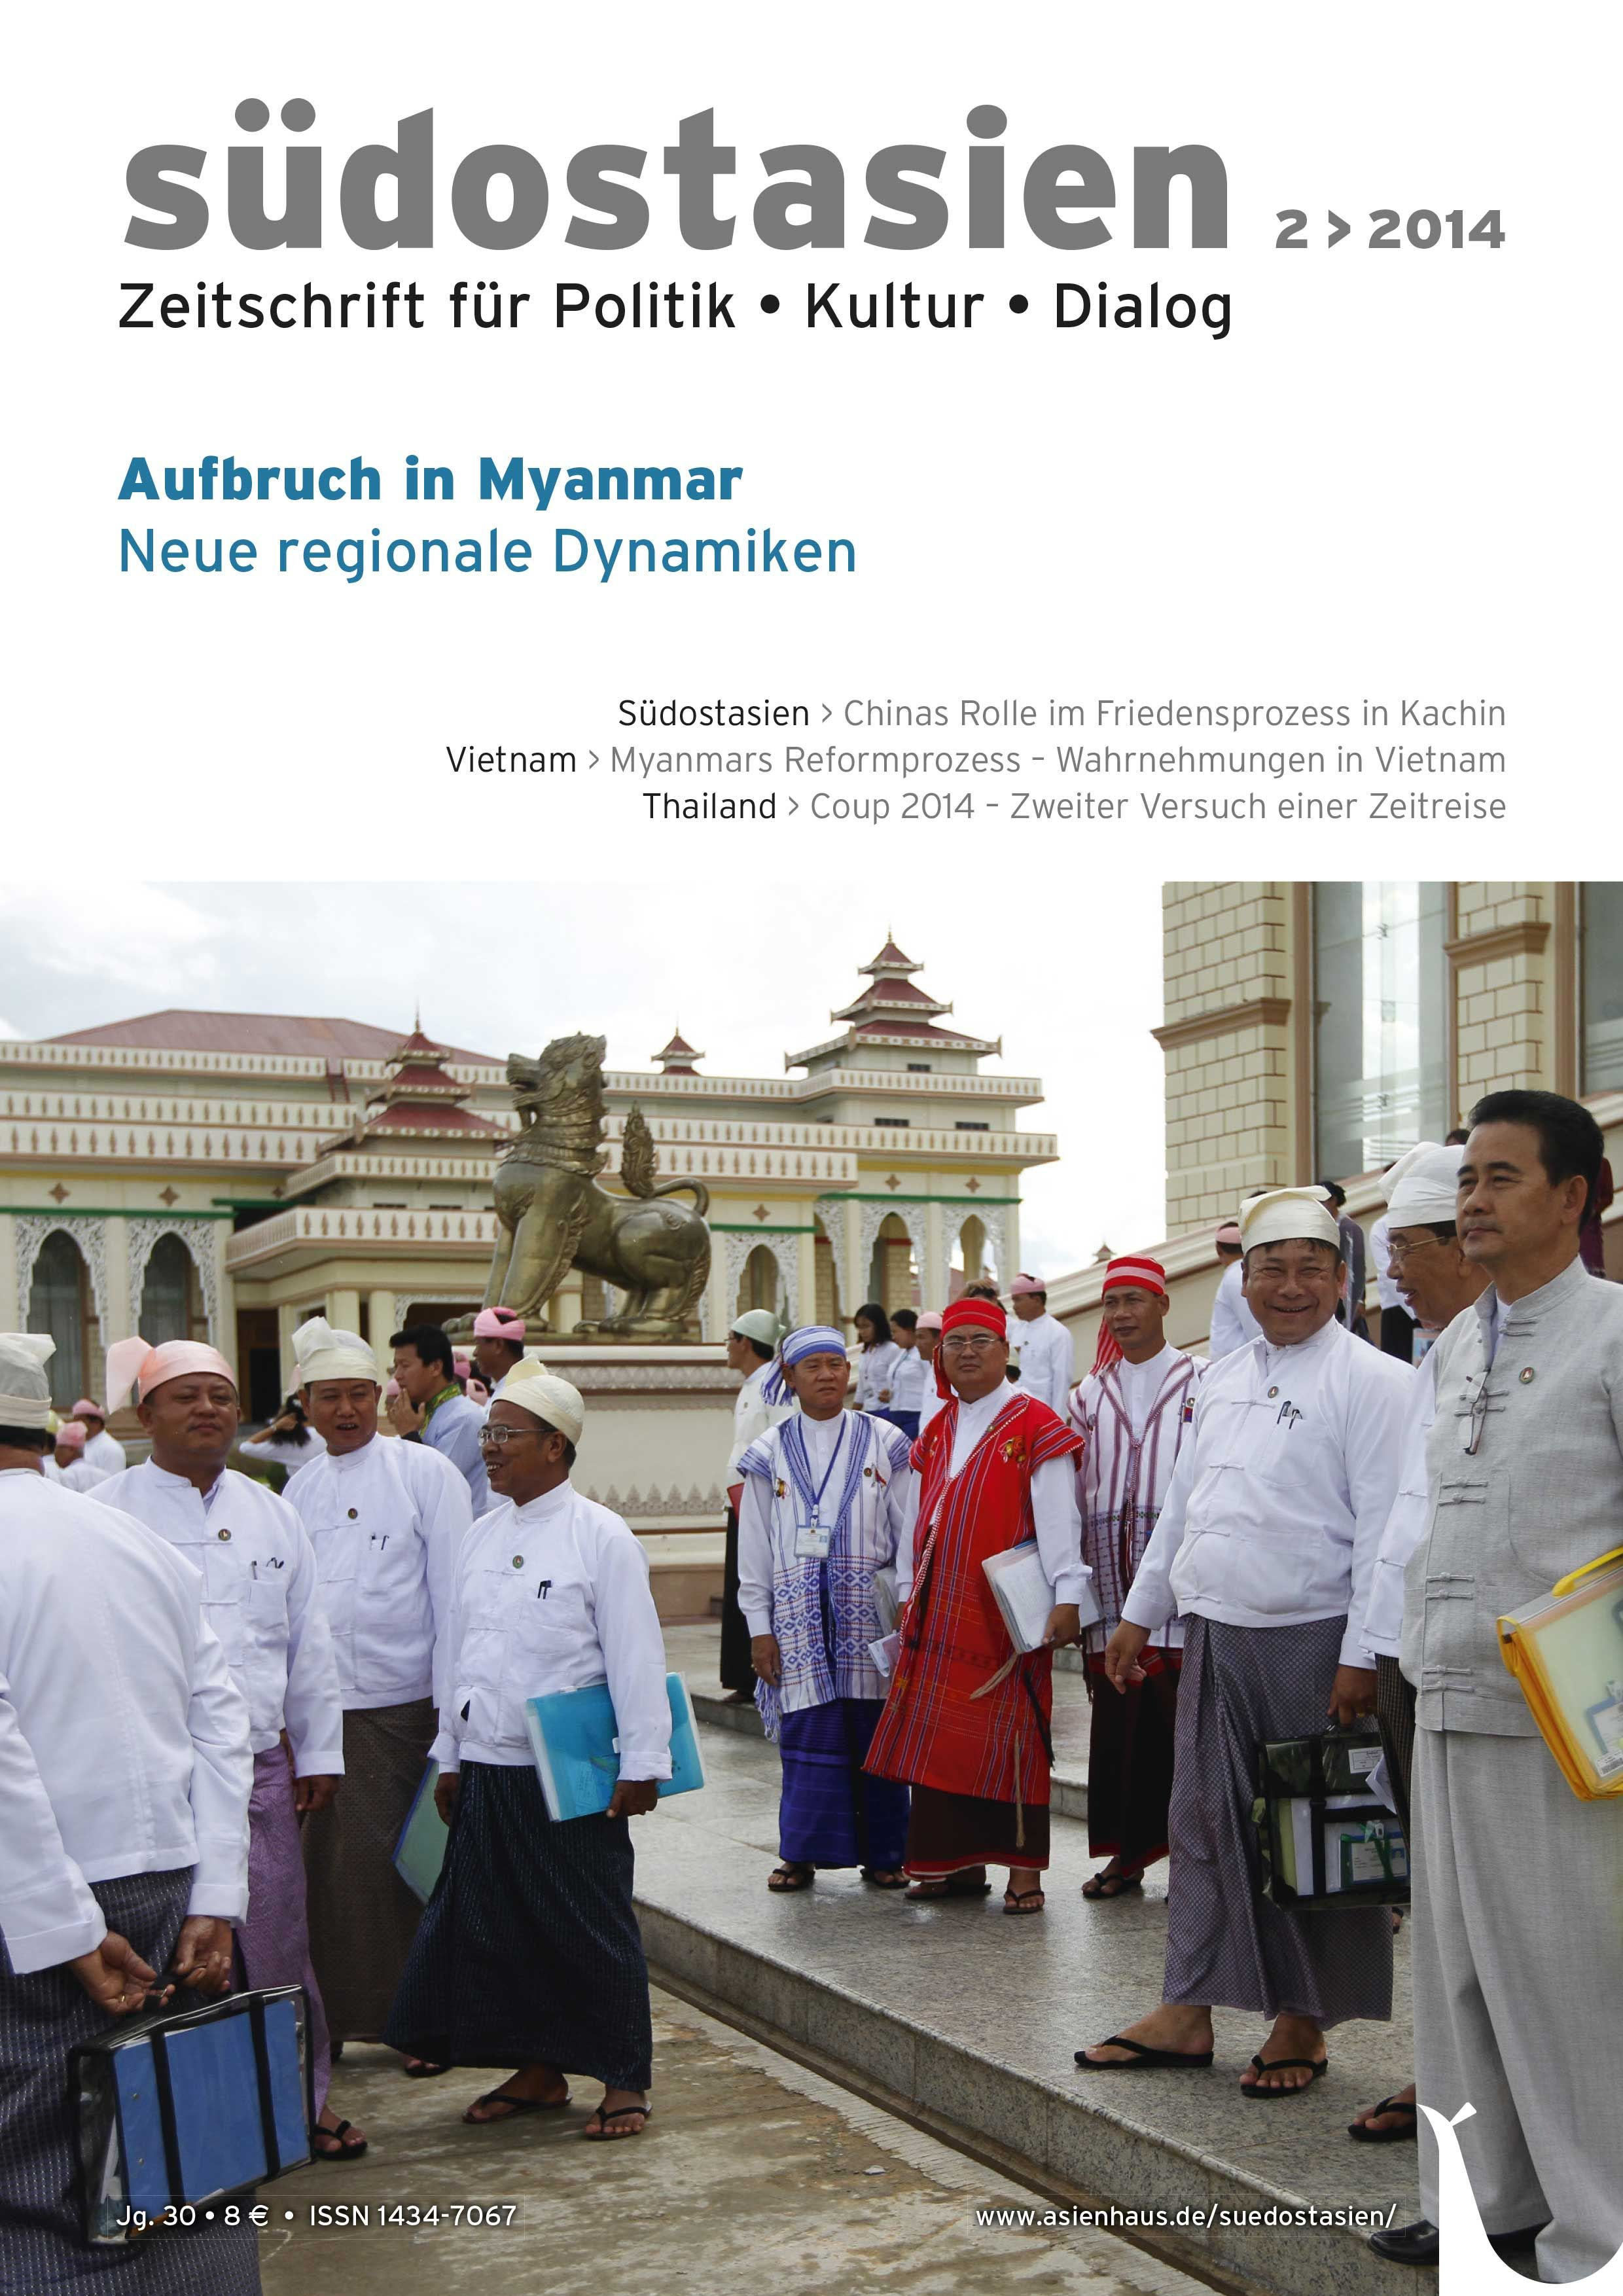 Aufbruch in Myanmar